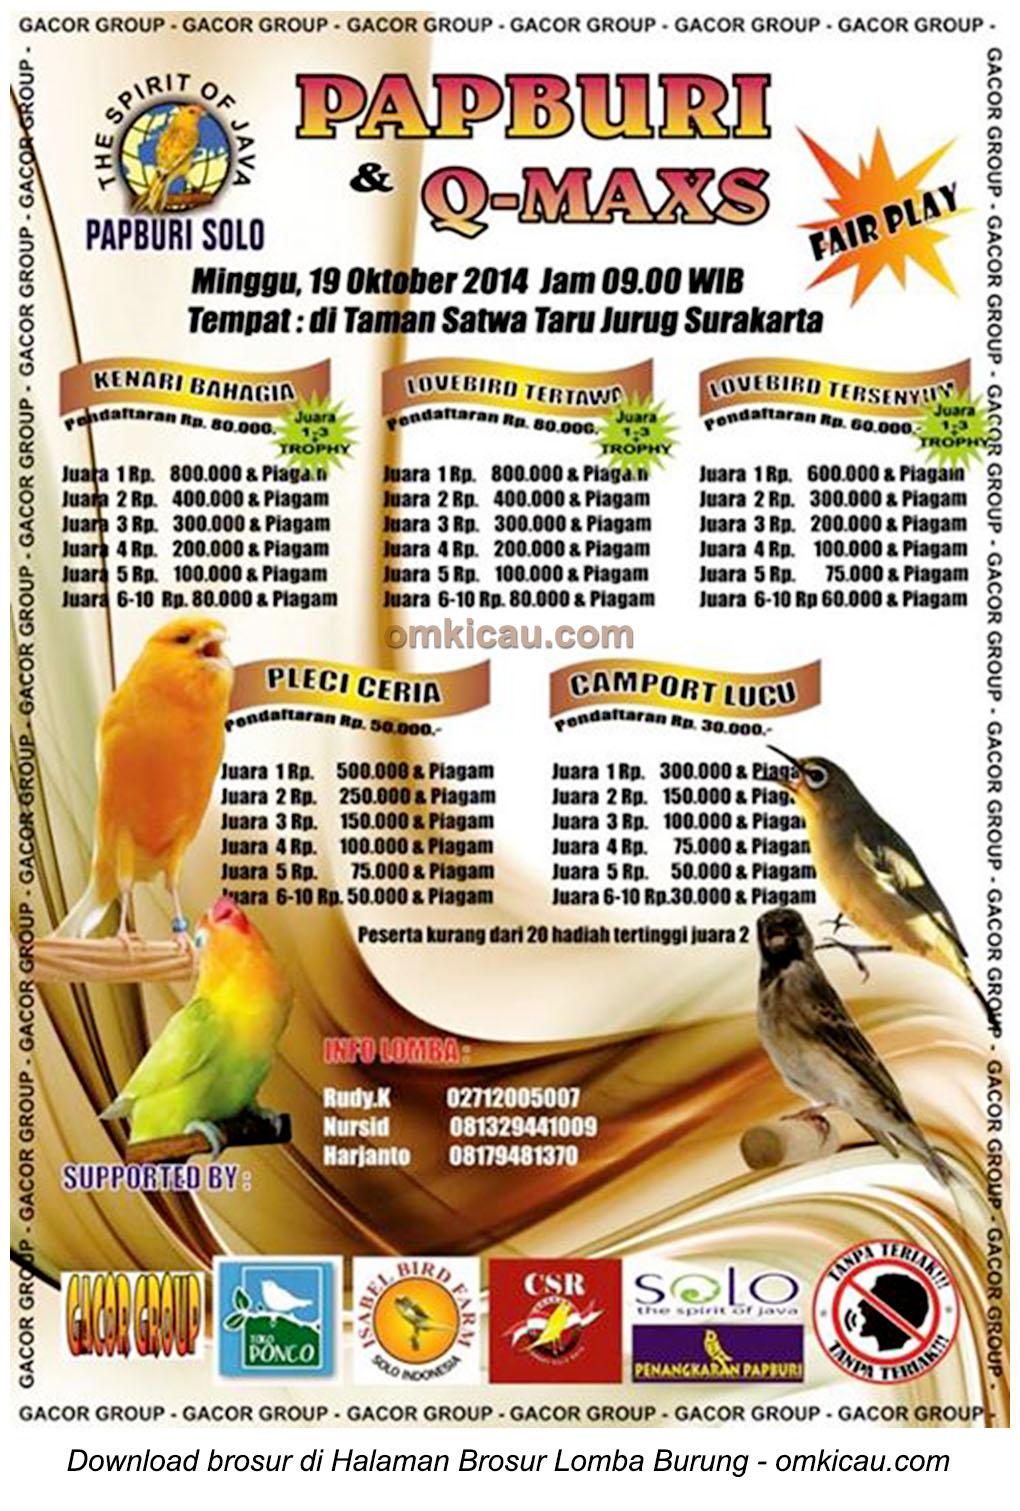 Brosur Lomba Burung Berkicau Papburi Solo 19 Oktober 2014